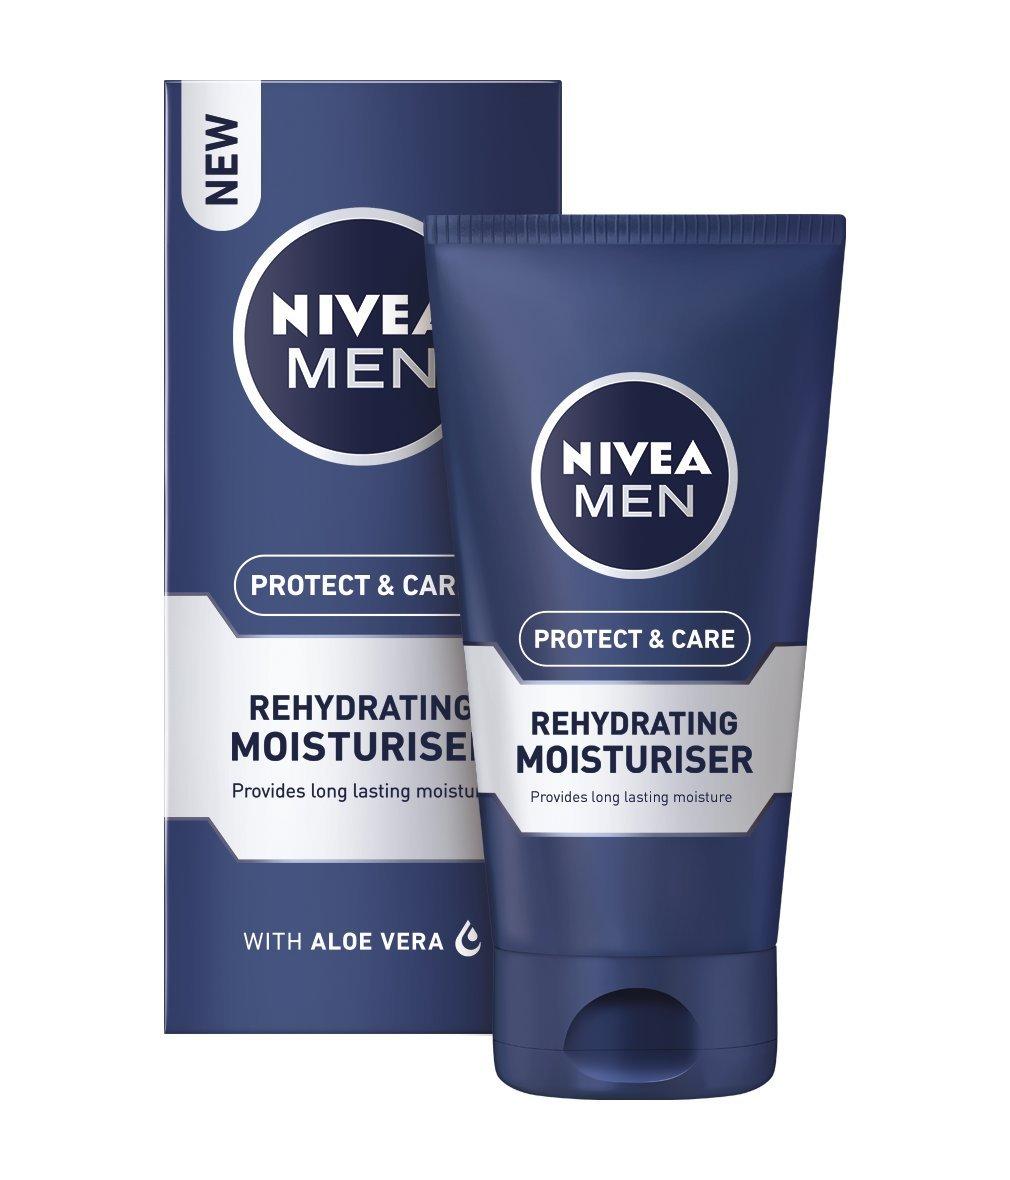 Nivea Men Rehydrating Moisturiser, 75 ml - Pack of 2 77157